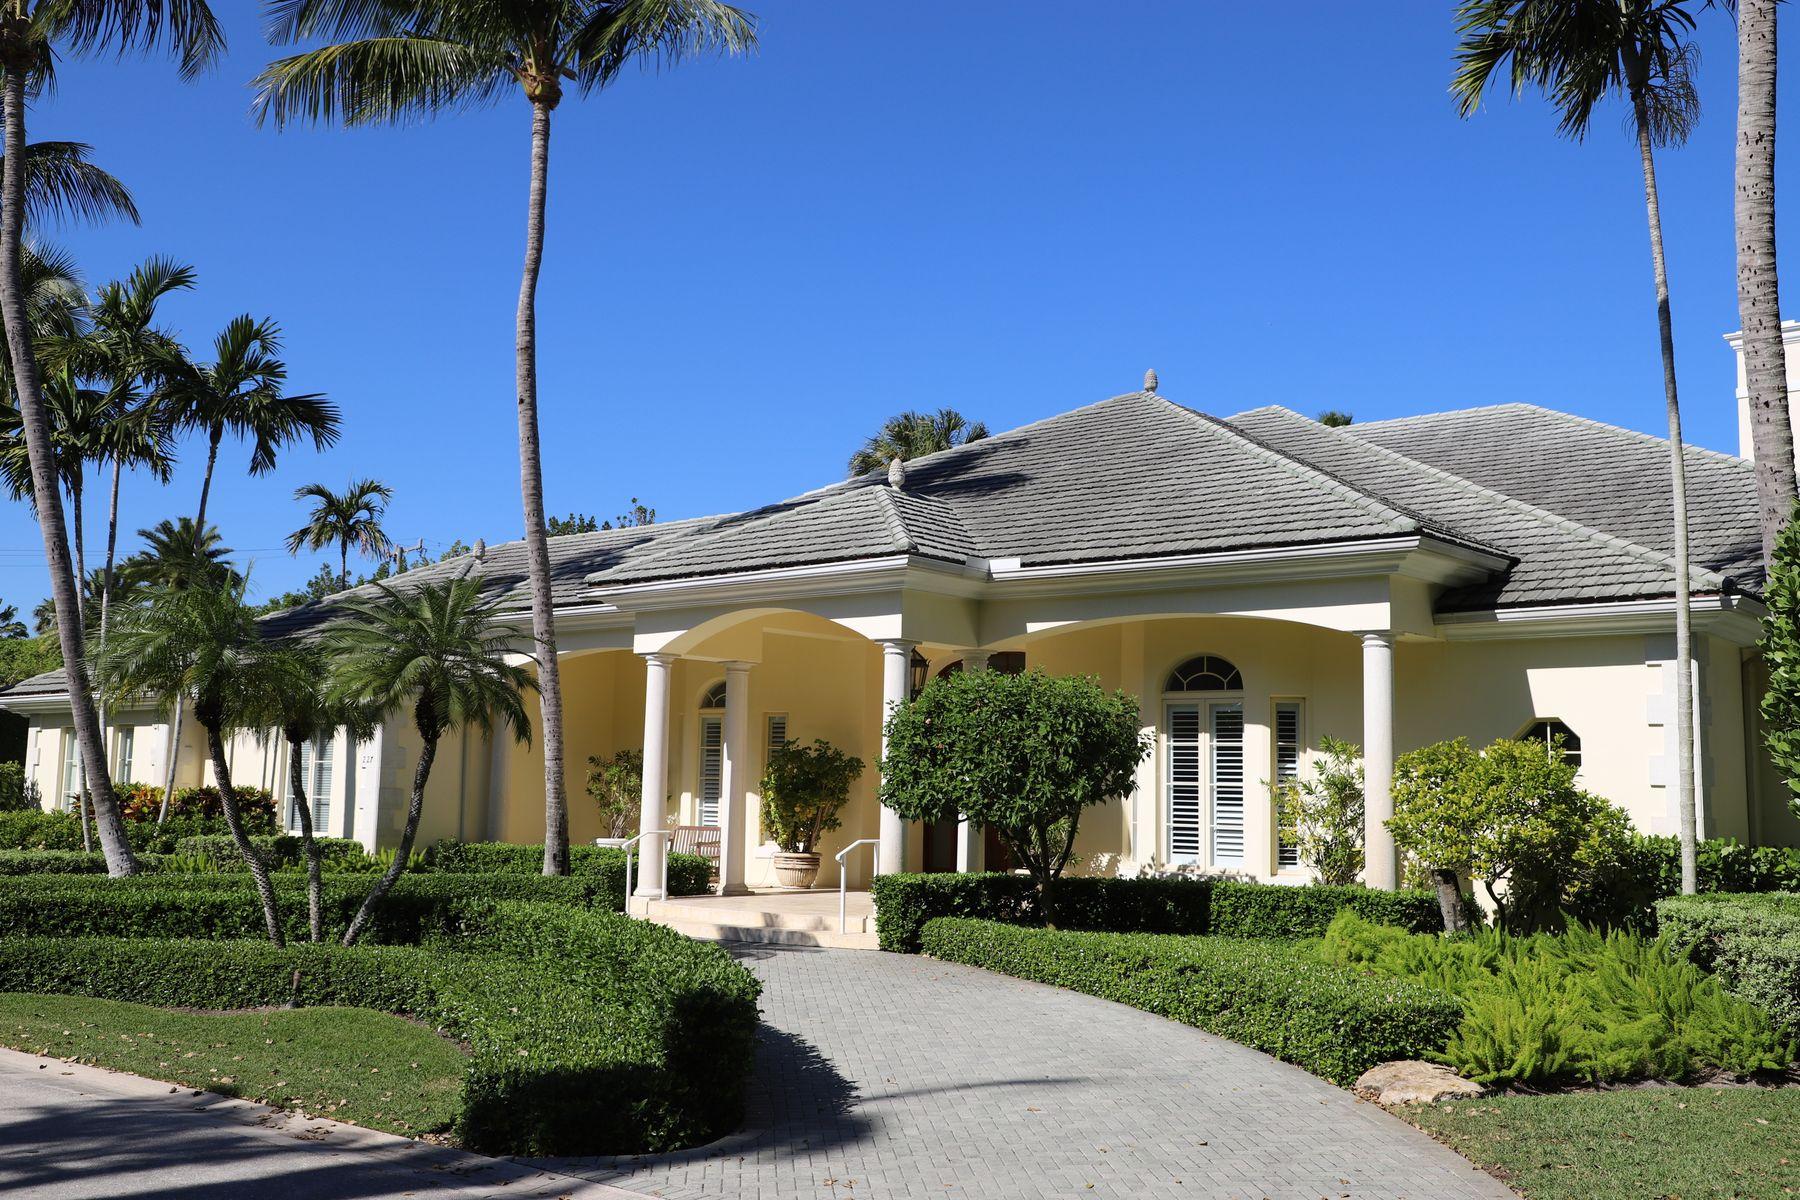 Single Family Home for Active at Stunning Bermuda Home at 227 Via Tortuga 227 Via Tortuga Palm Beach, Florida 33480 United States